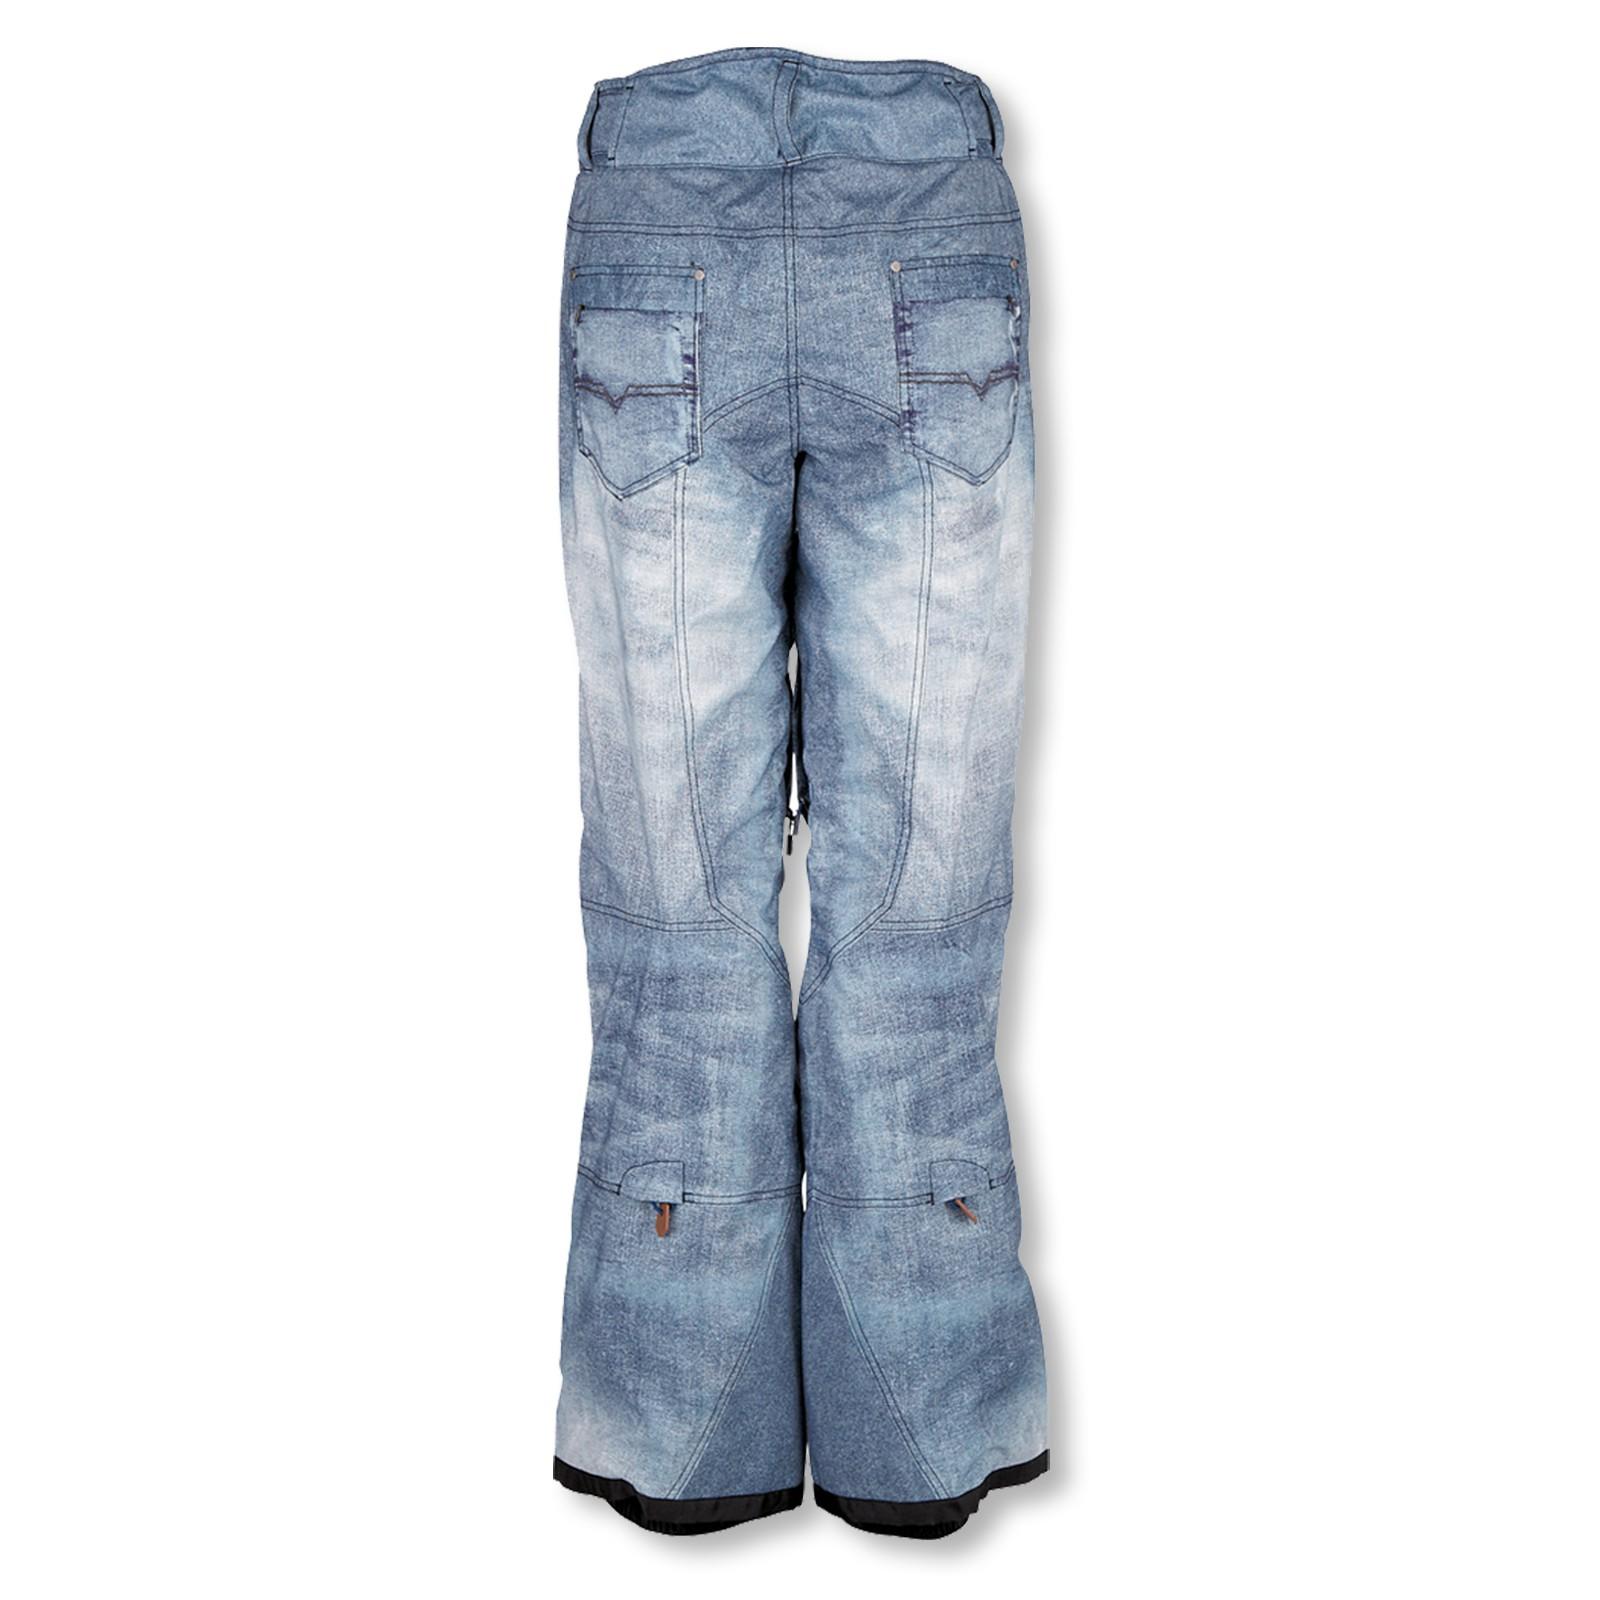 Chiemsee Damen Snowboardhose Snow Pants Hilke 2 S M L 1090804 in starlight blue